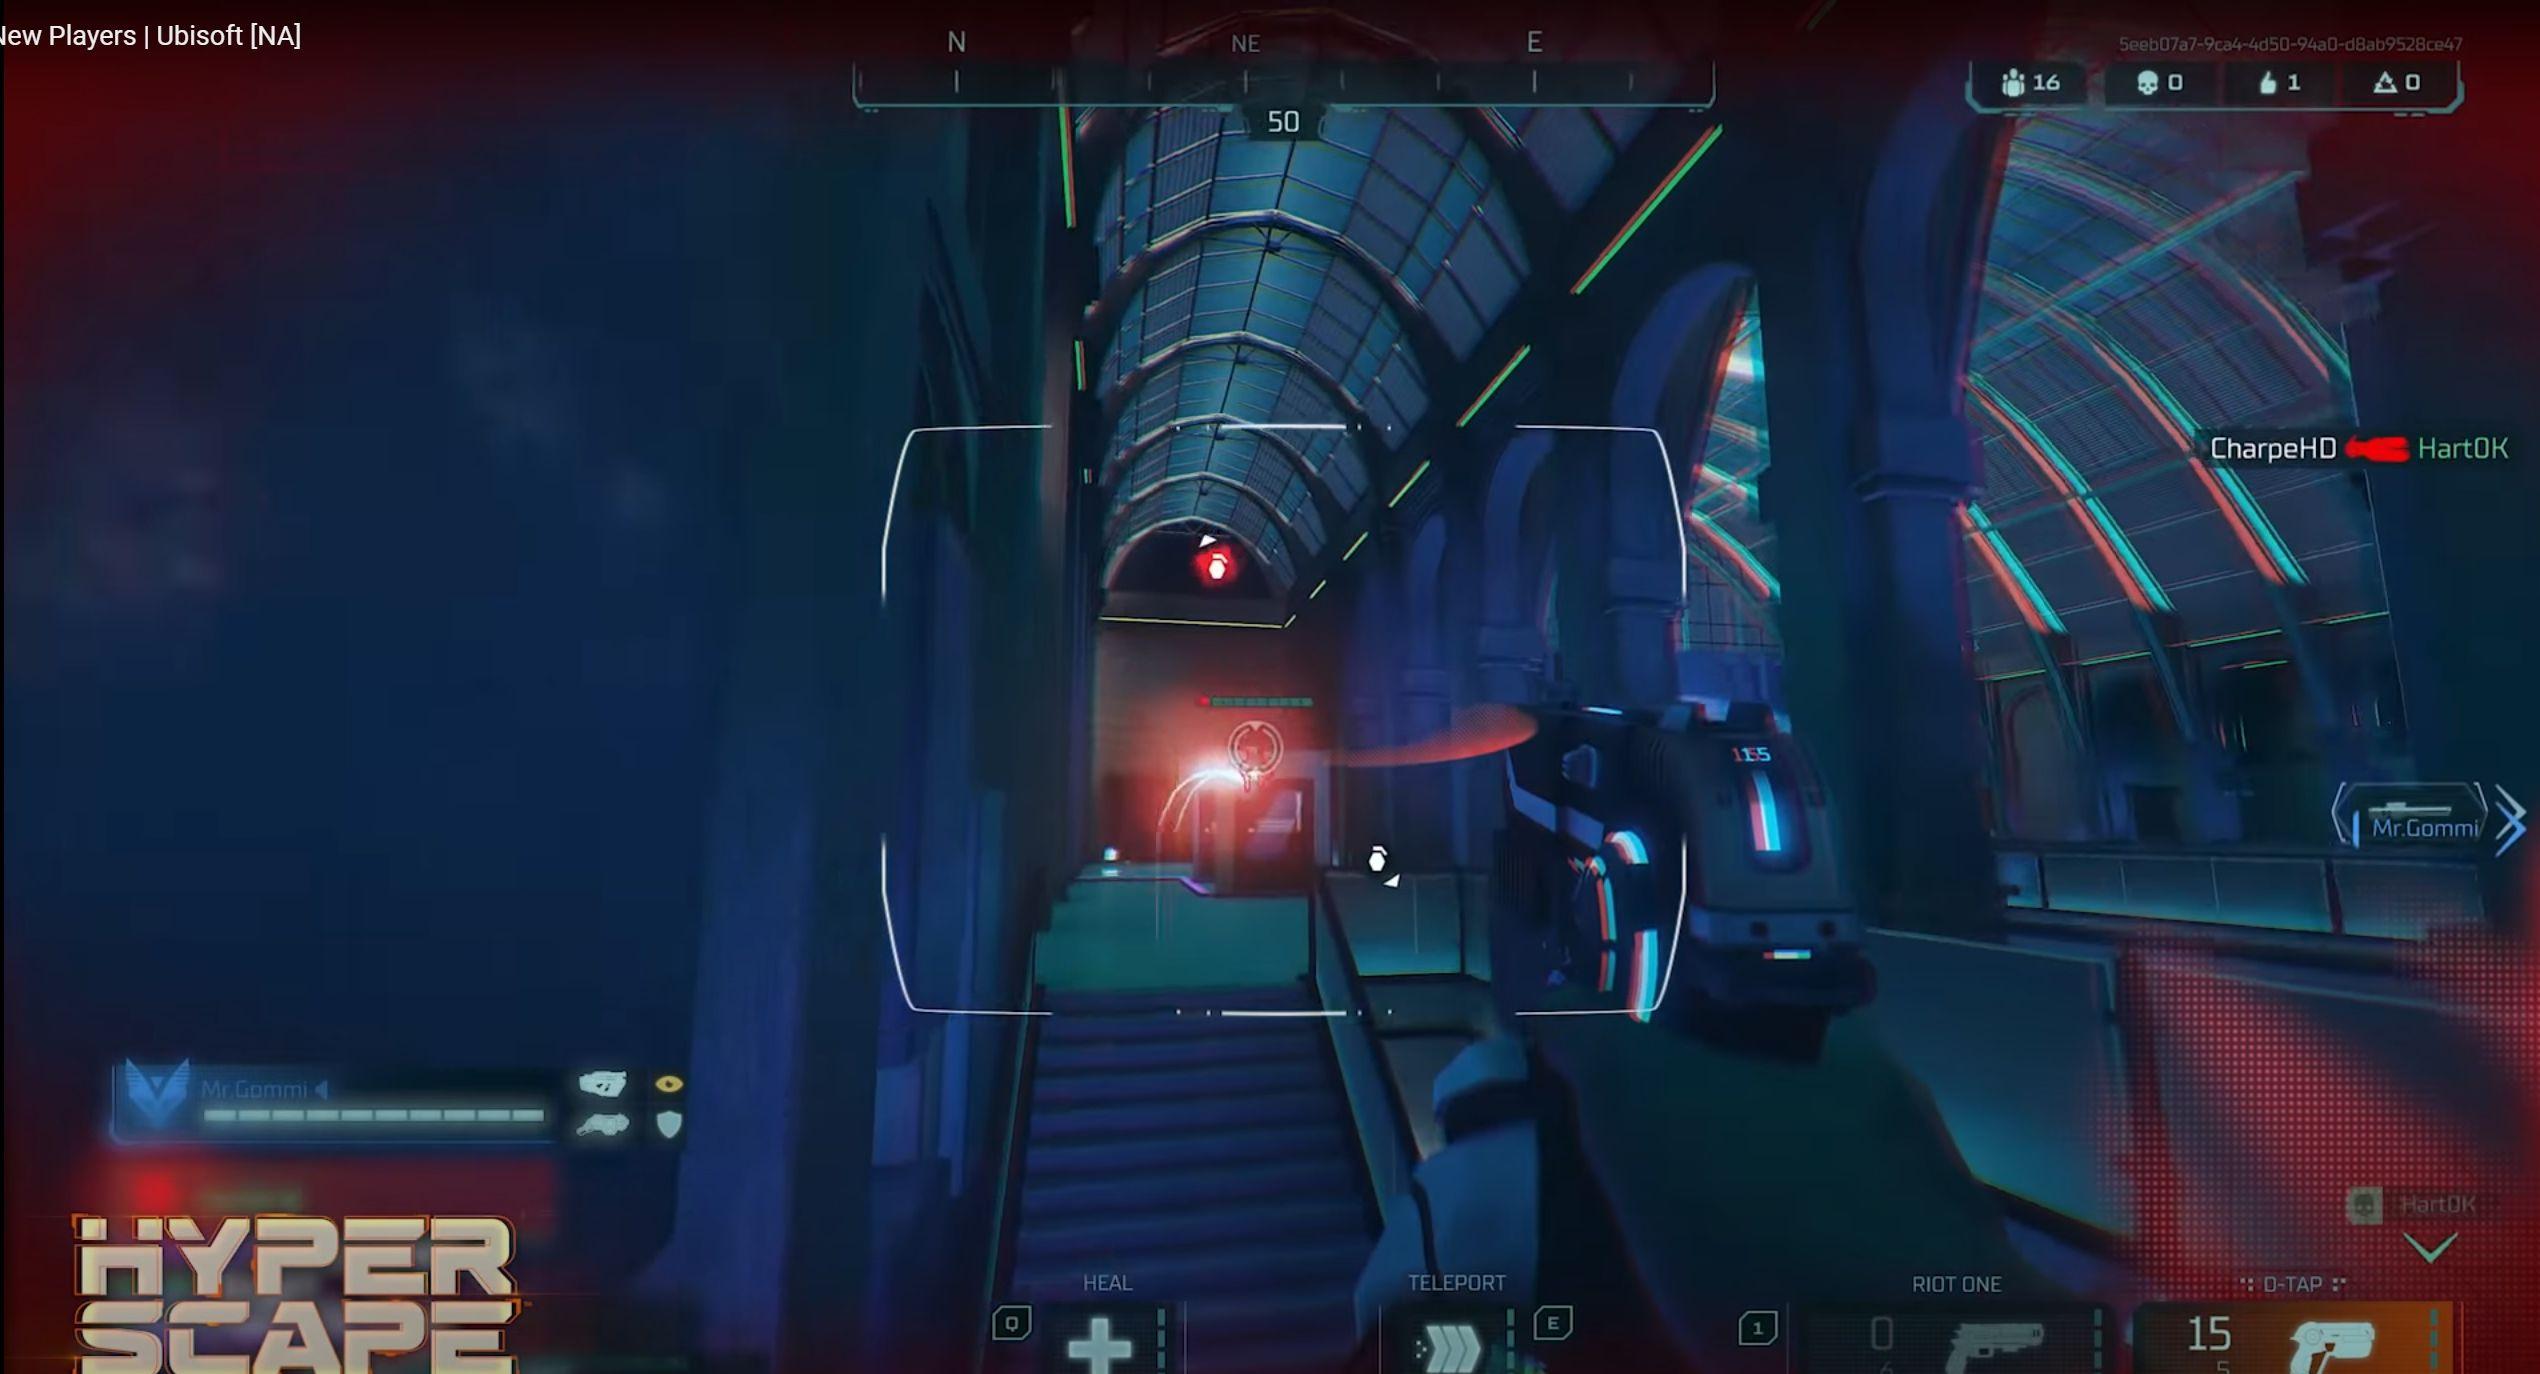 Spillet har en futuristisk setting